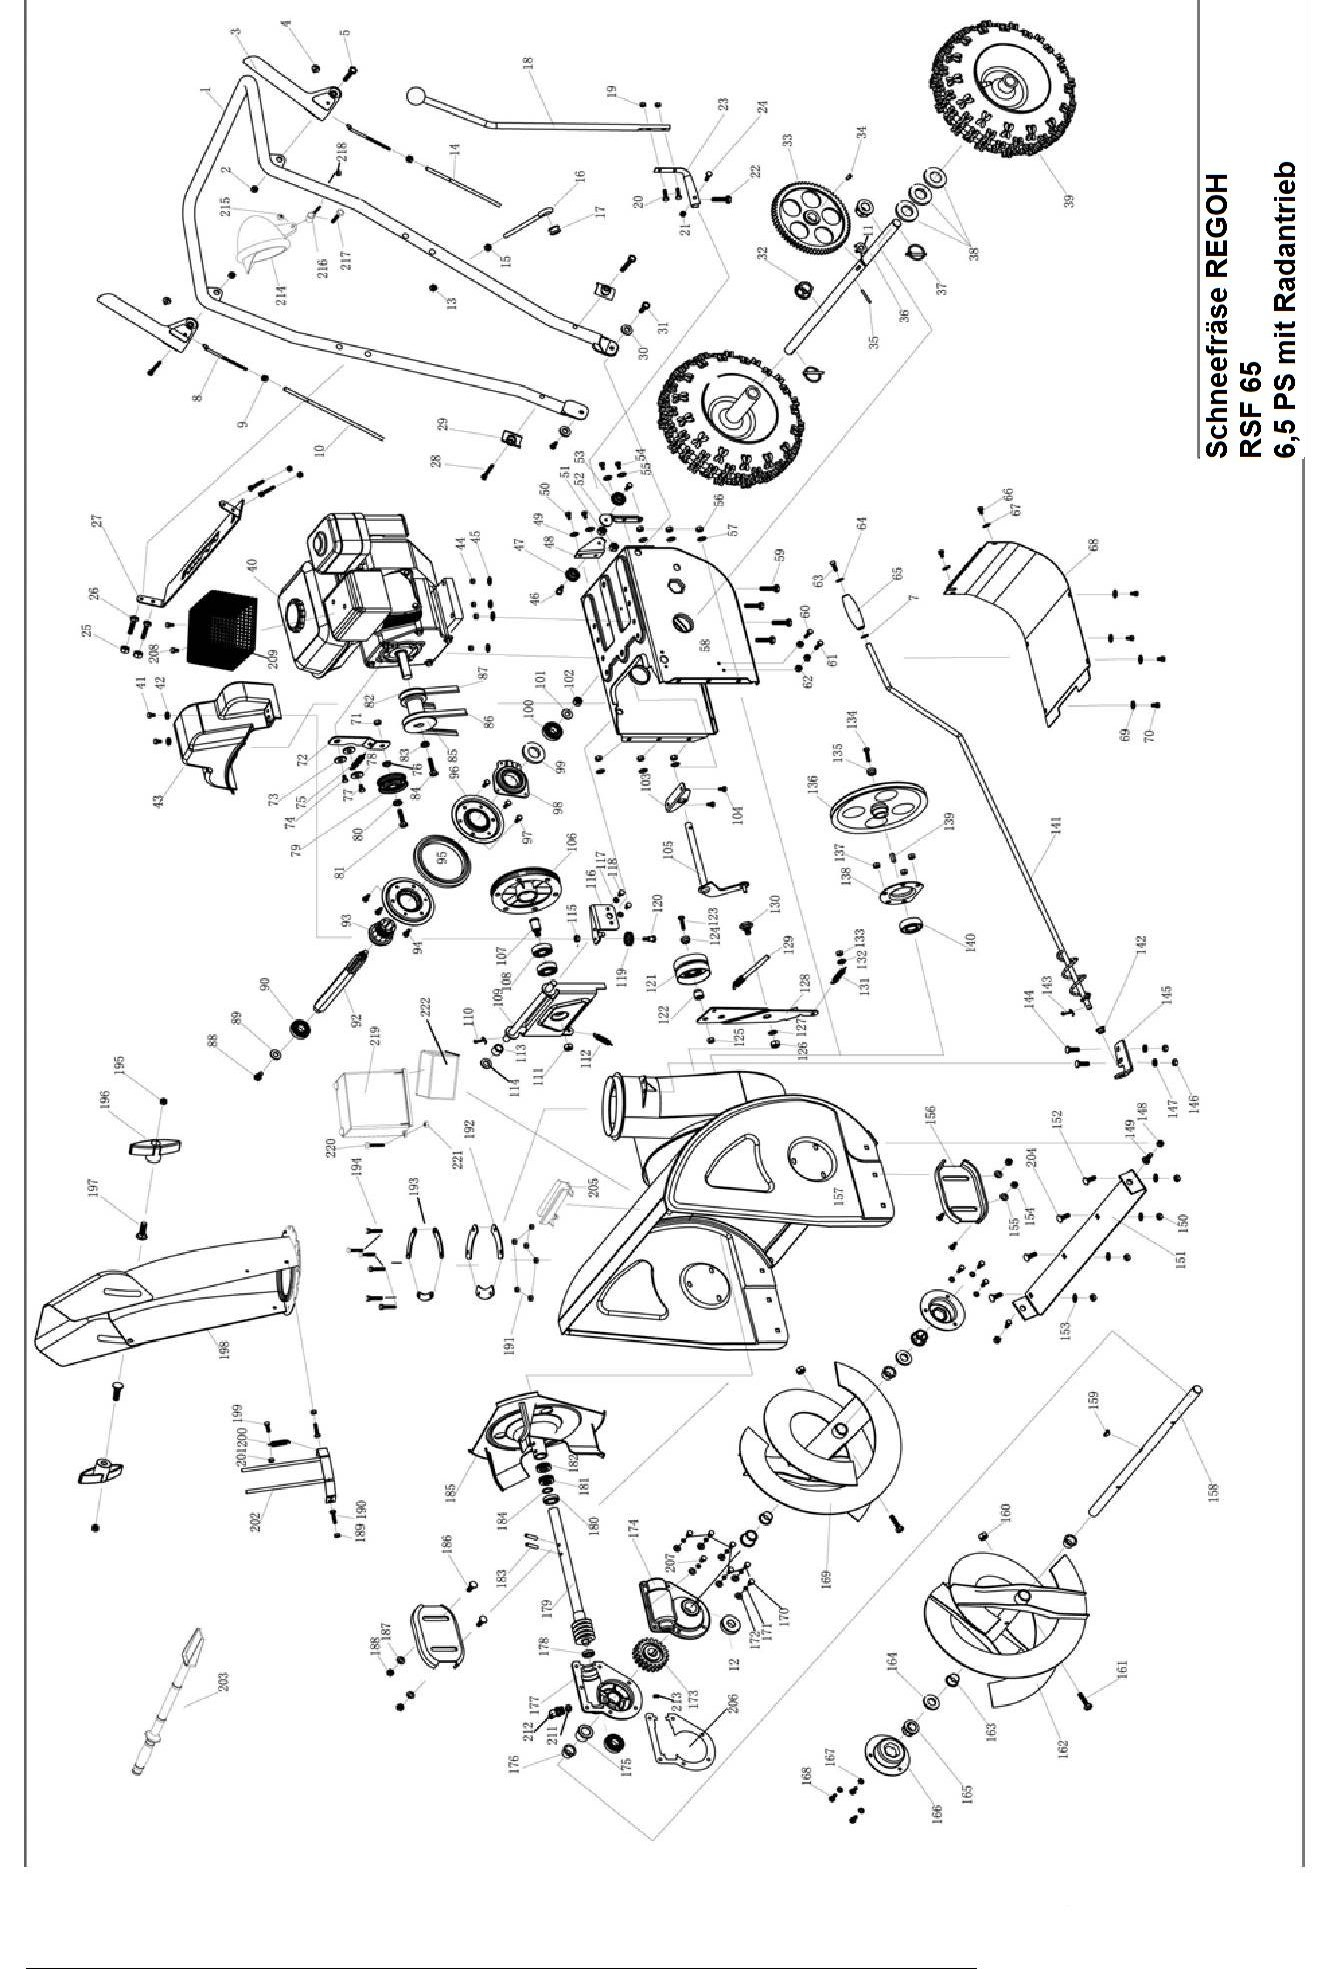 Similiar Stihl 290 Parts Diagram Keywords Ms 441 028 Chainsaw Carburetor 025 Honda Gcv 160 Explosionszeichnung Energie Und Baumaschinen